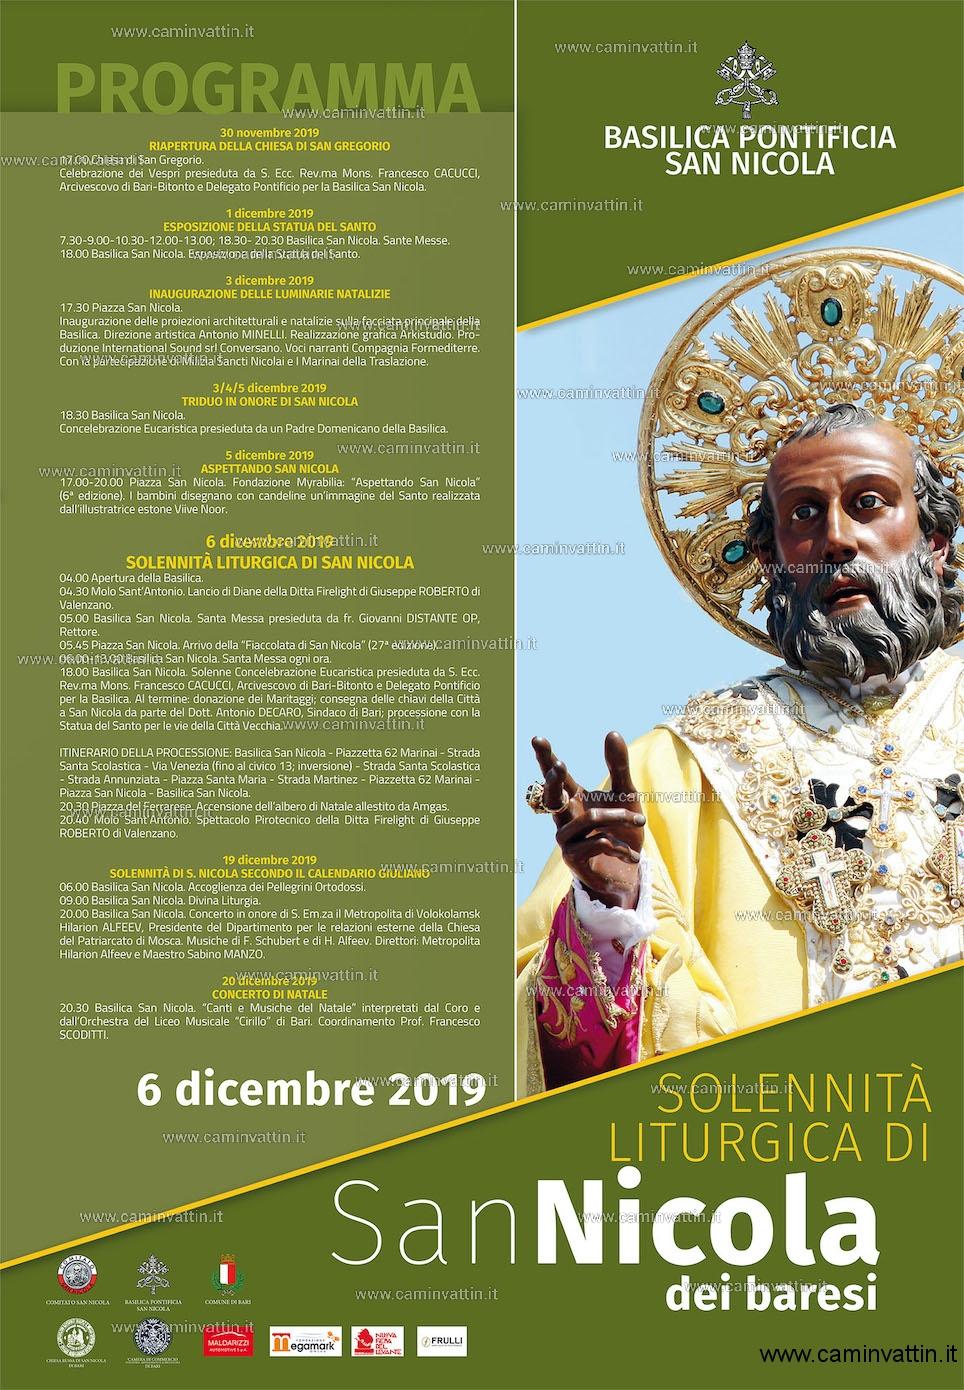 solennita liturgica san nicola 2019